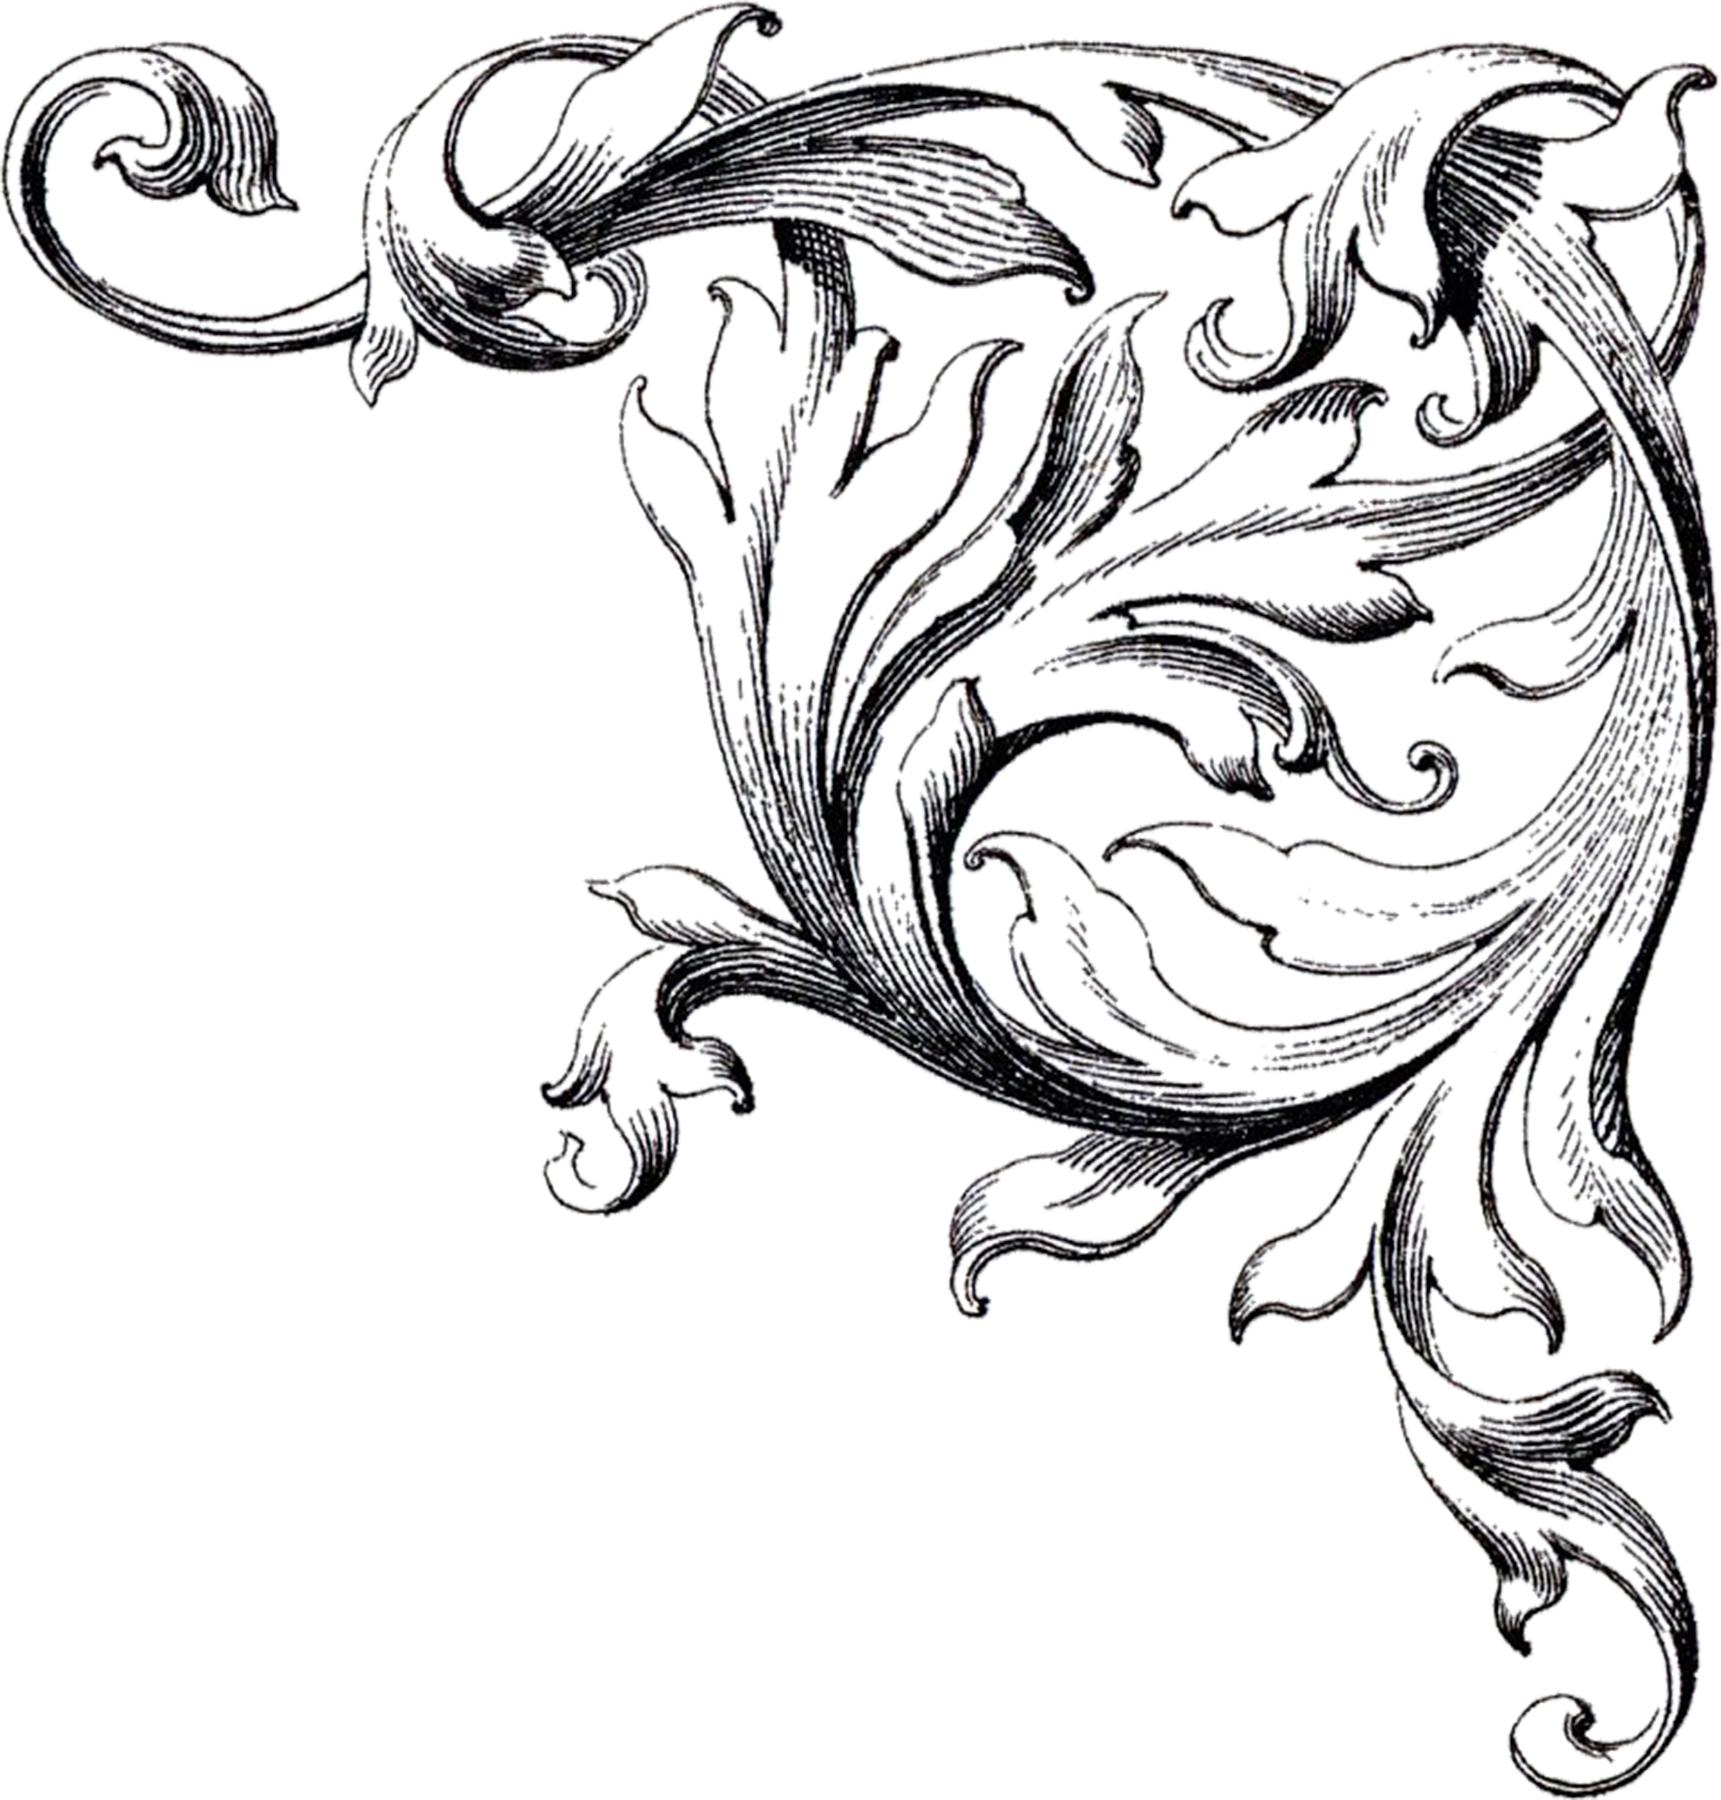 Free Wedding Clip Art Scrolls The Graphics Fairy